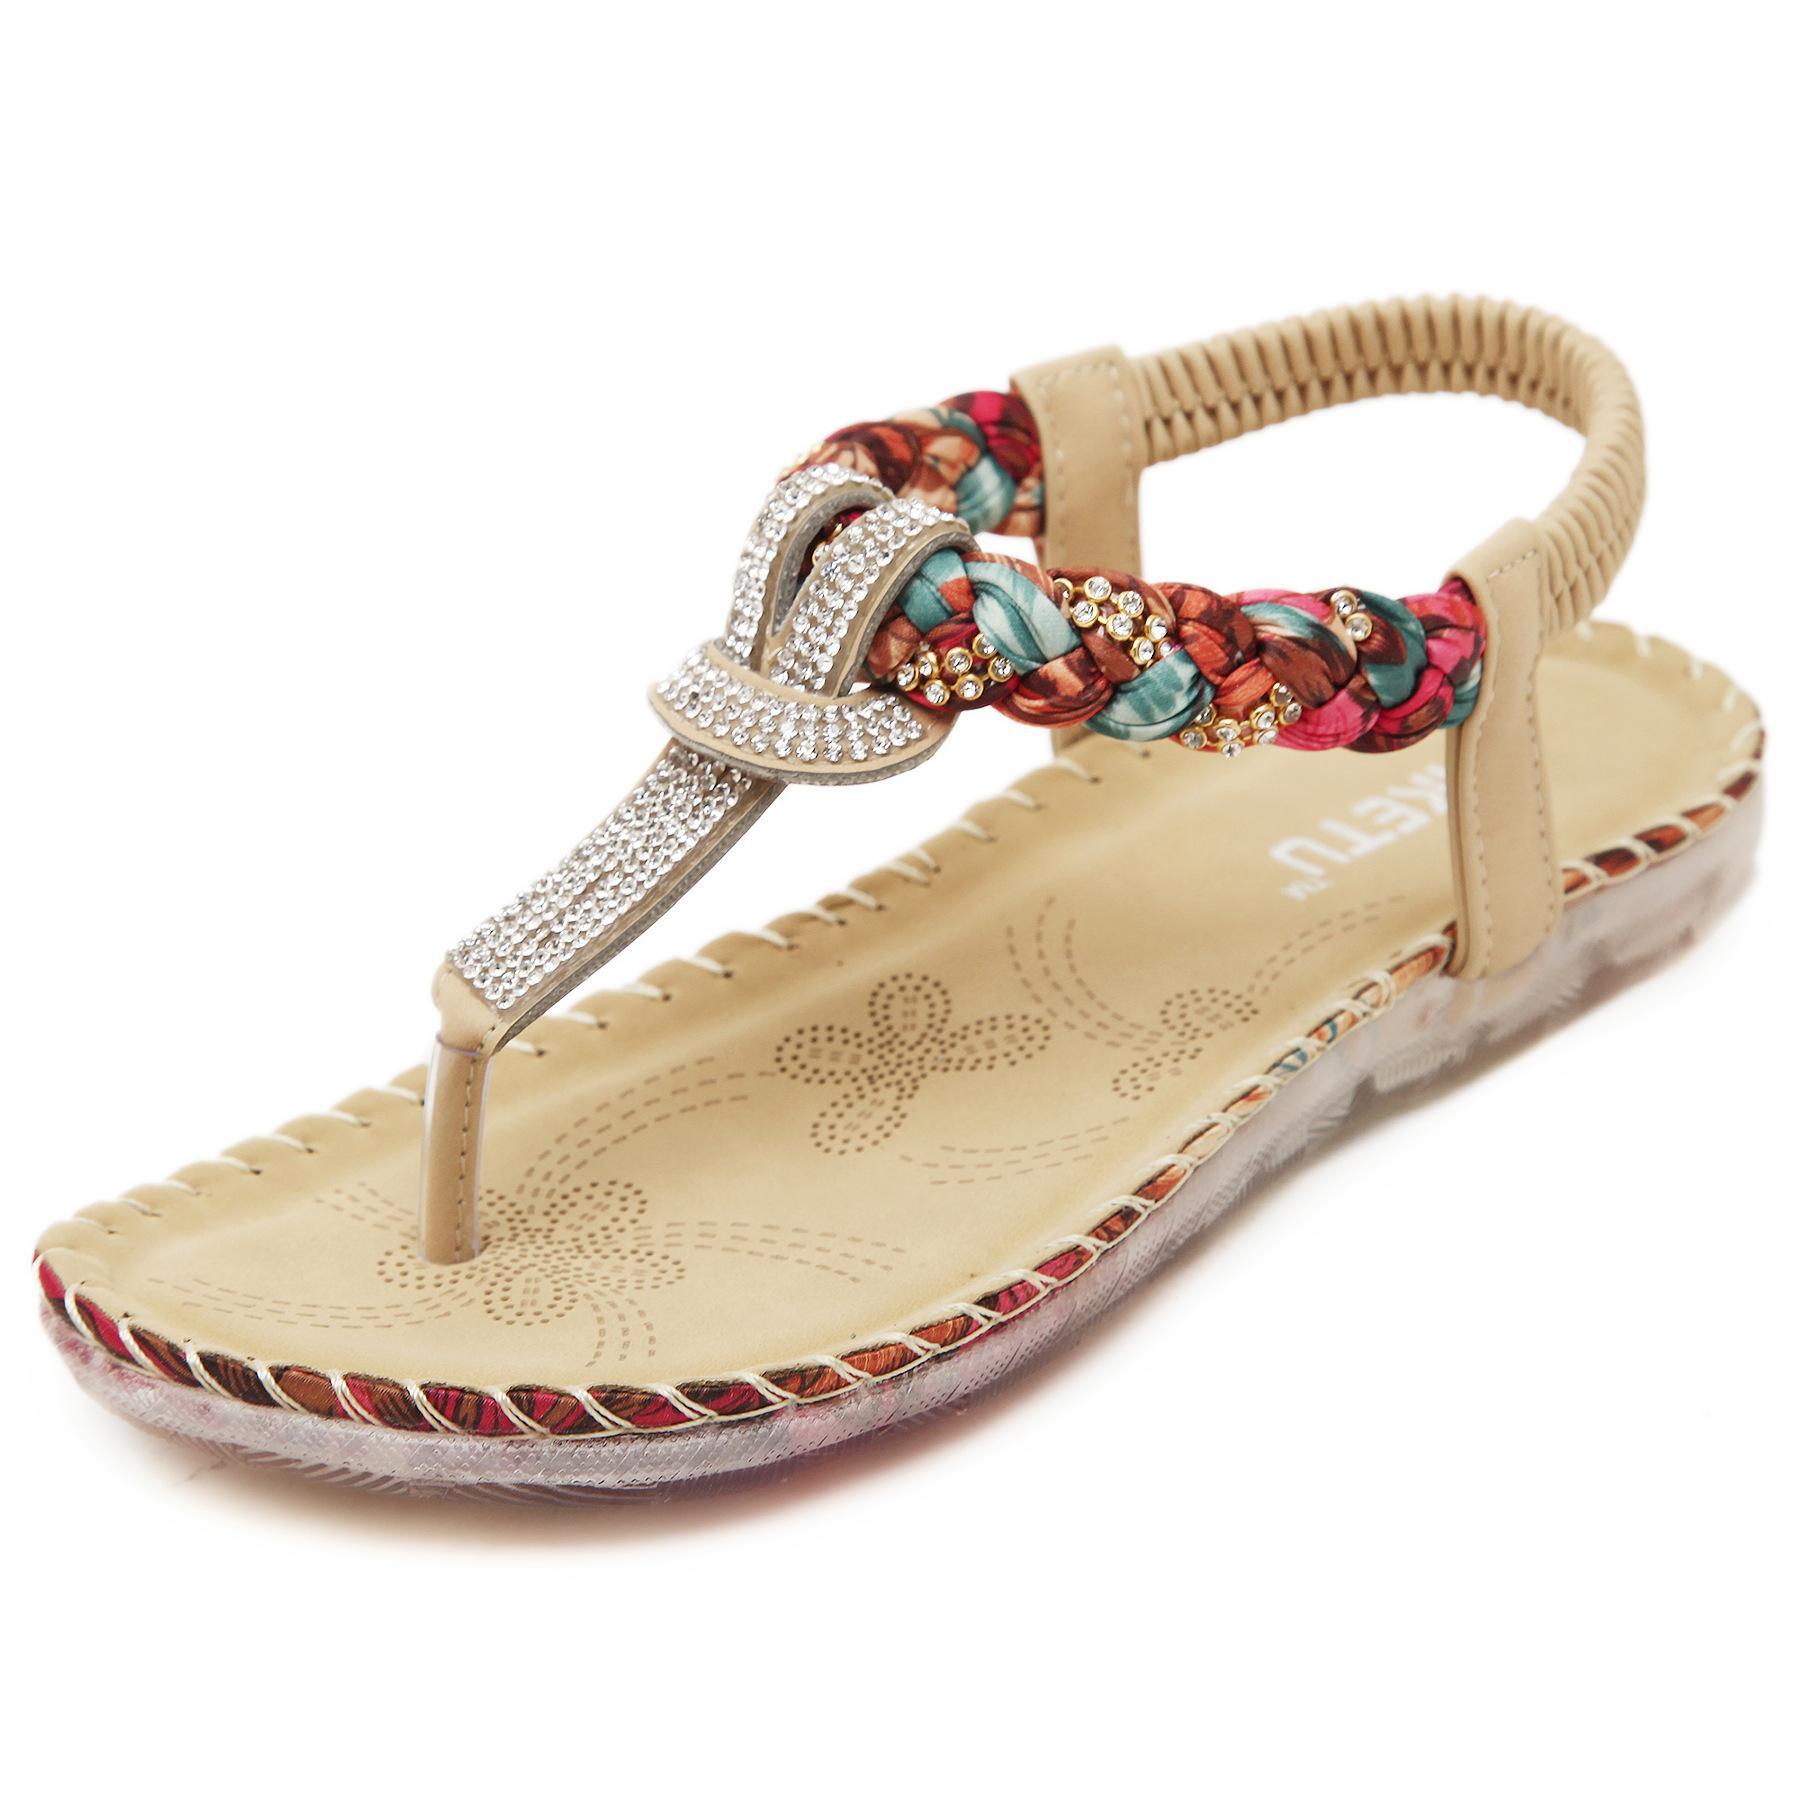 ccce63d9c1441 New Fashion Ethnic Style Women Sandals Bohemian Diamond Flat Big Yards Ladies  Shoes Ladies Beach Sandals Red Shoes Wedge Sandals From Vic peng